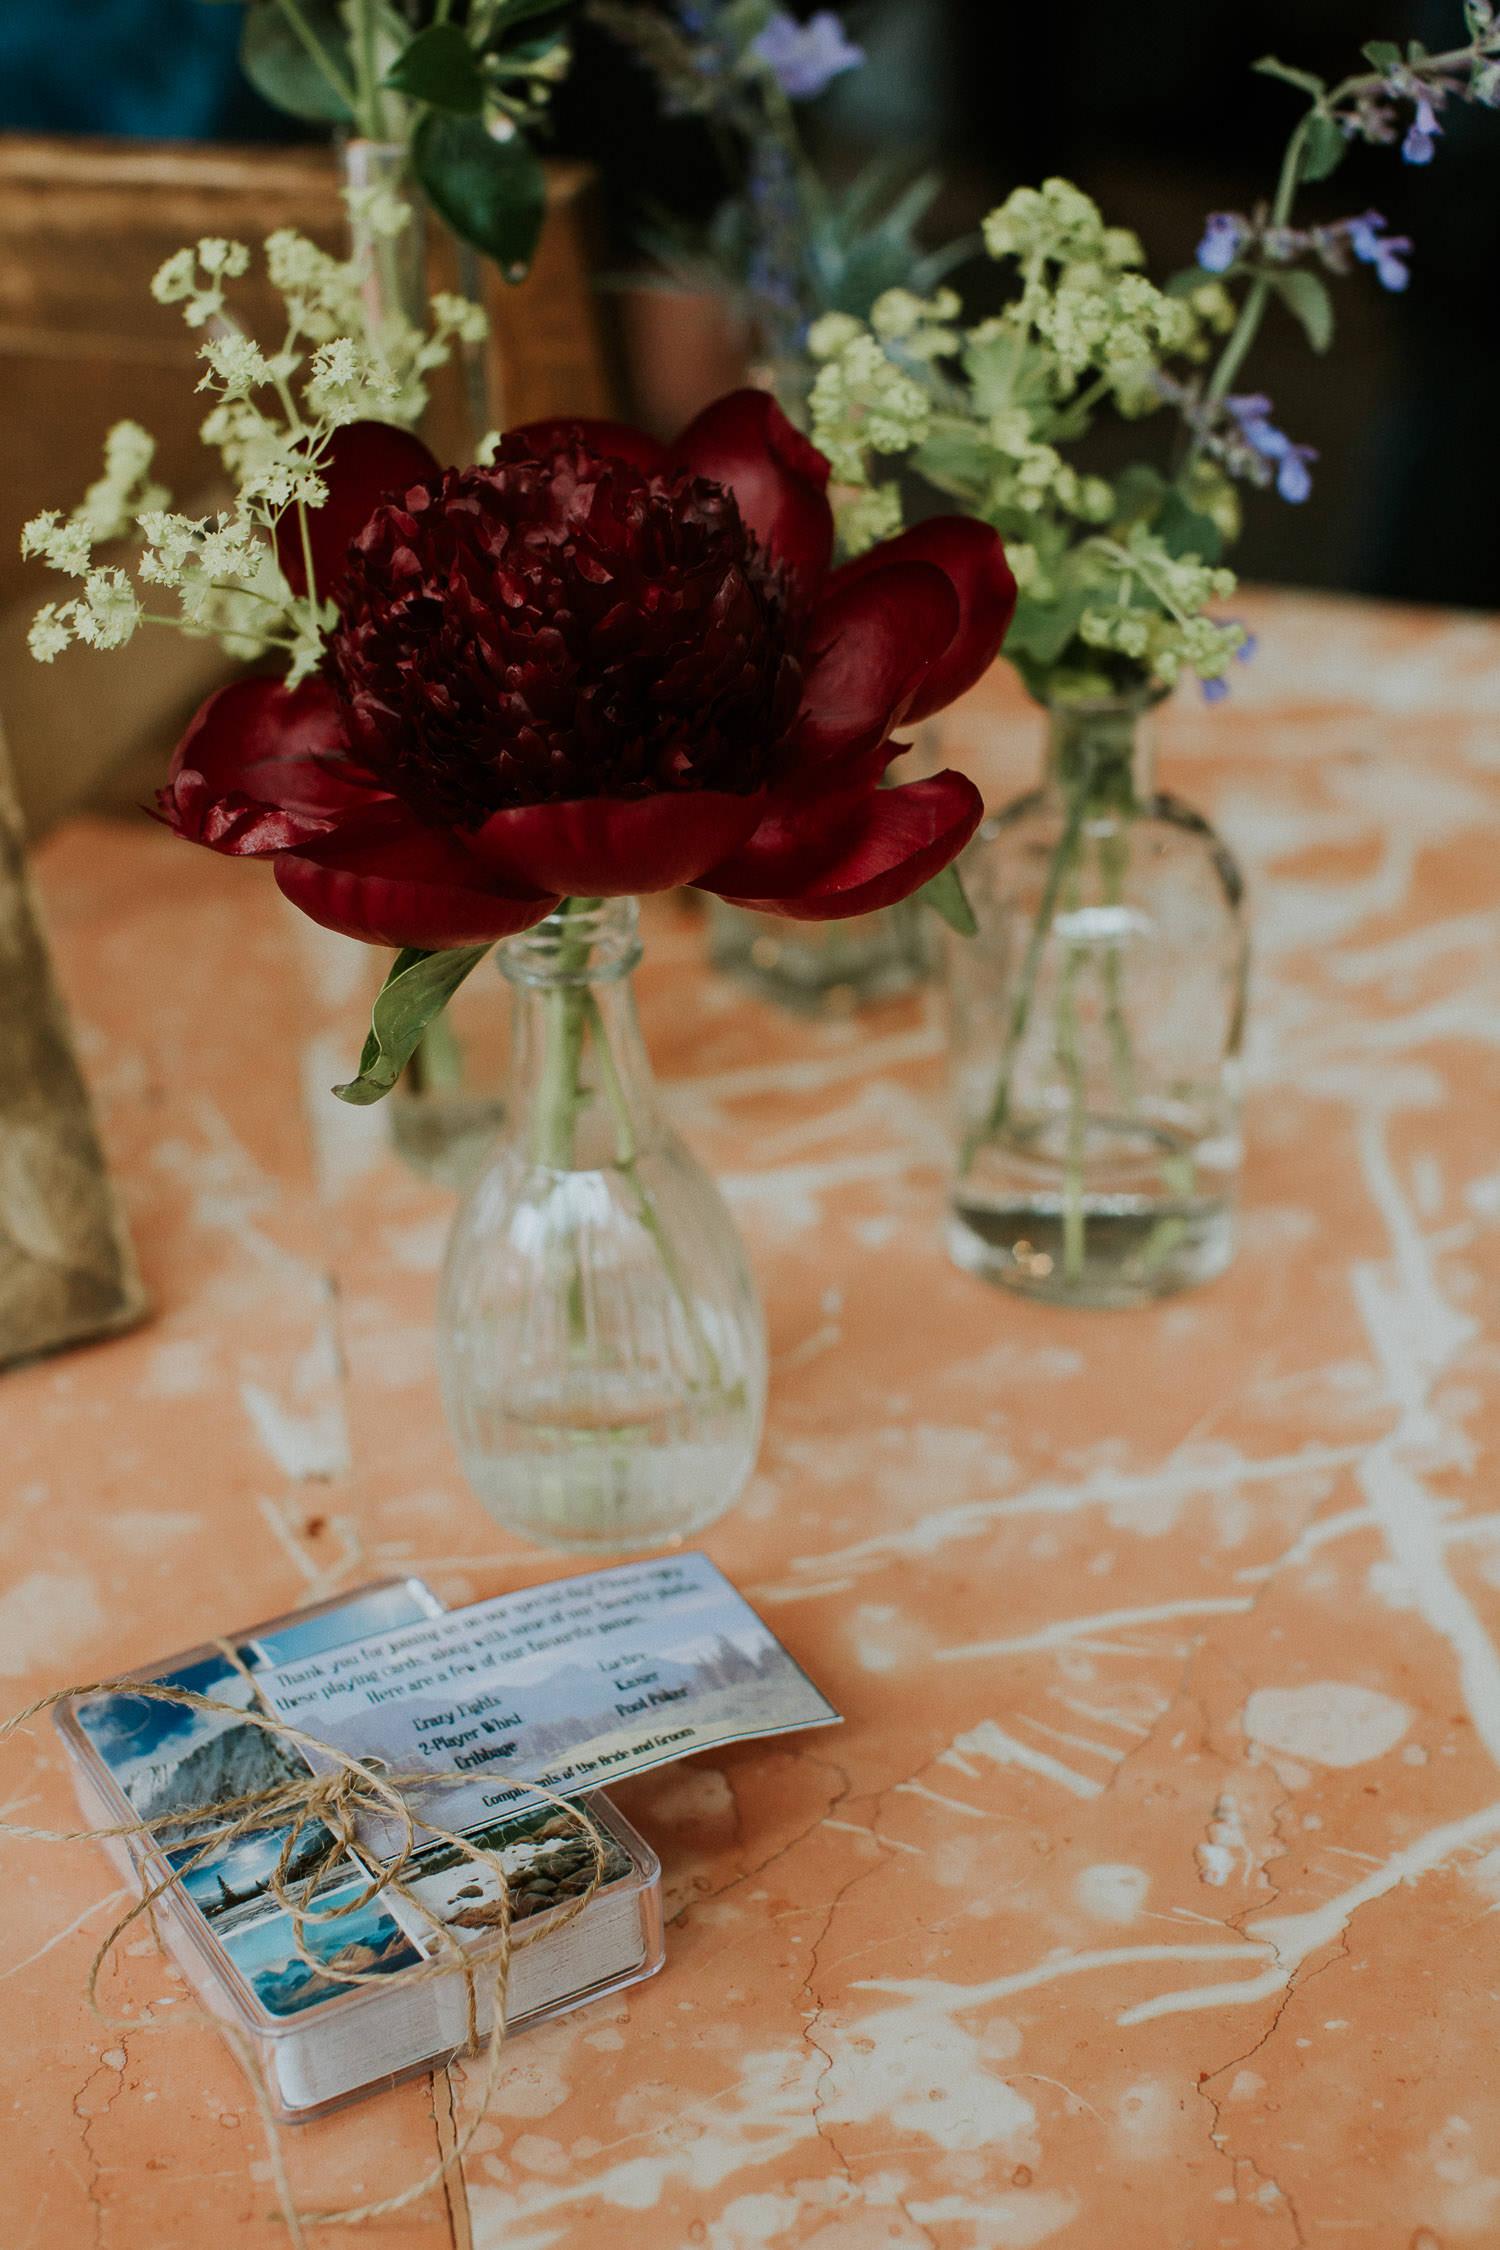 azuridge-estate-hotel-wedding-photographer-sarah-pukin-0186